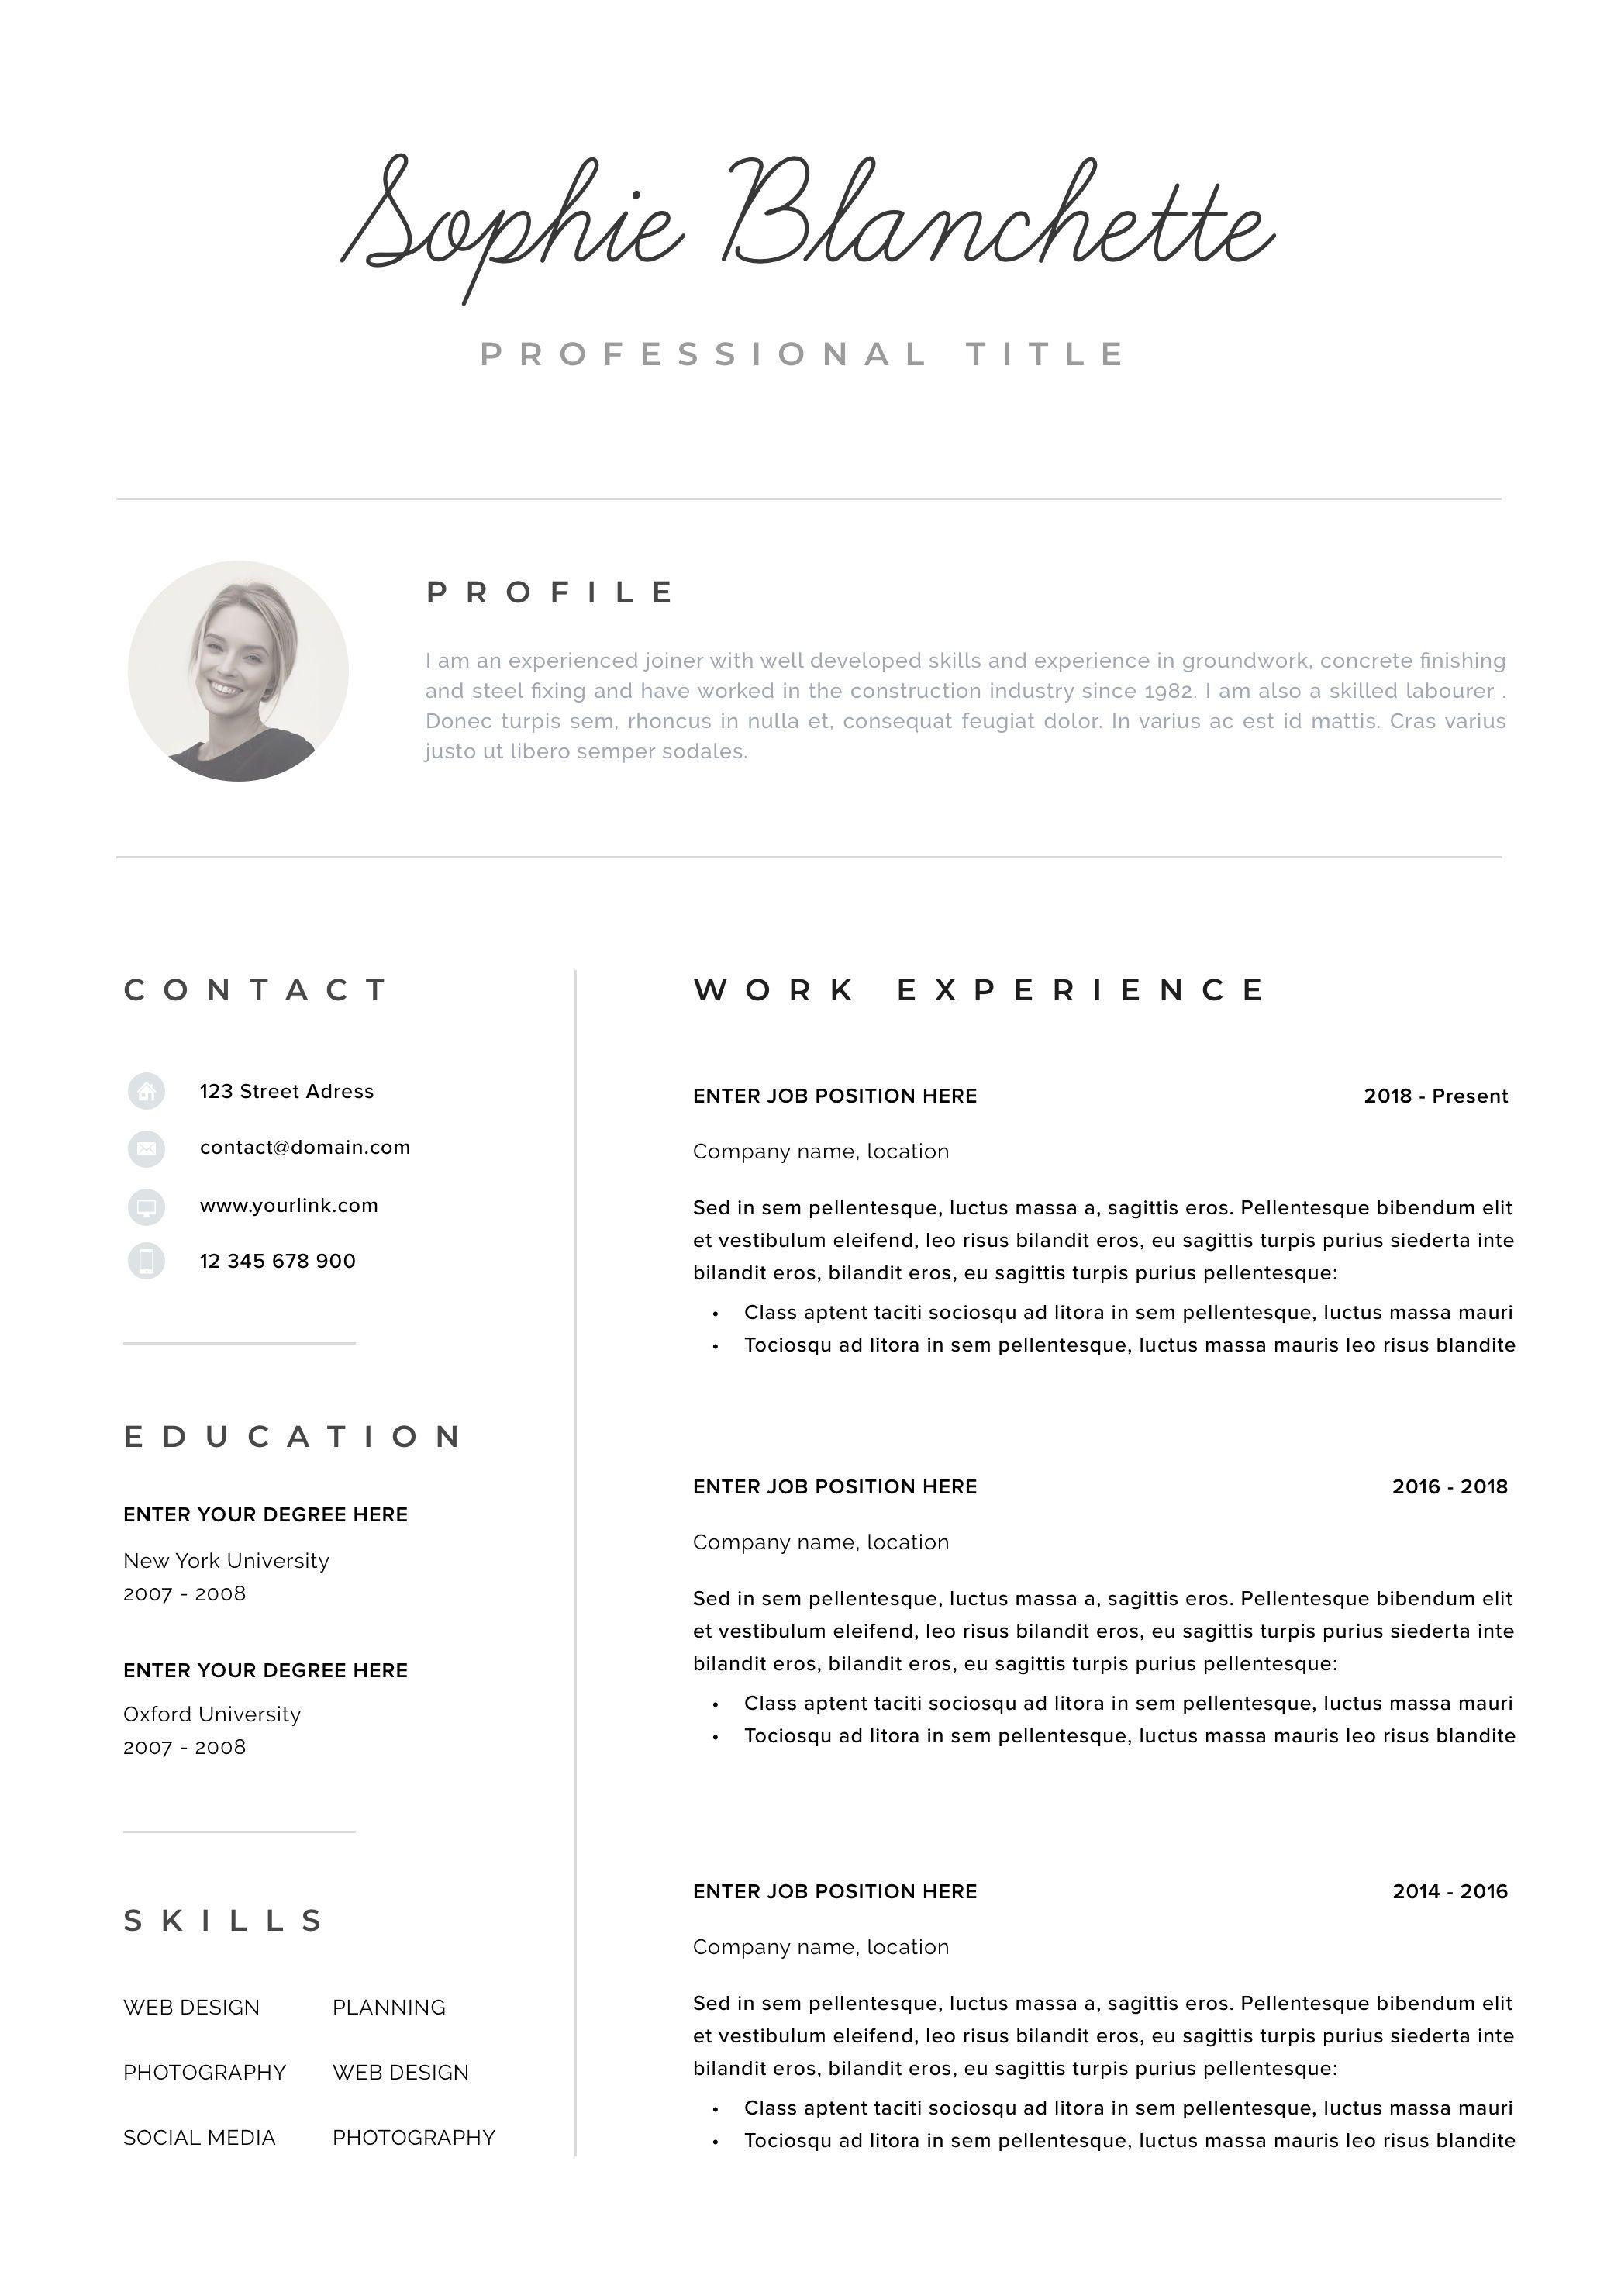 Resume Template Resume Cv Template Cv Design Curriculum